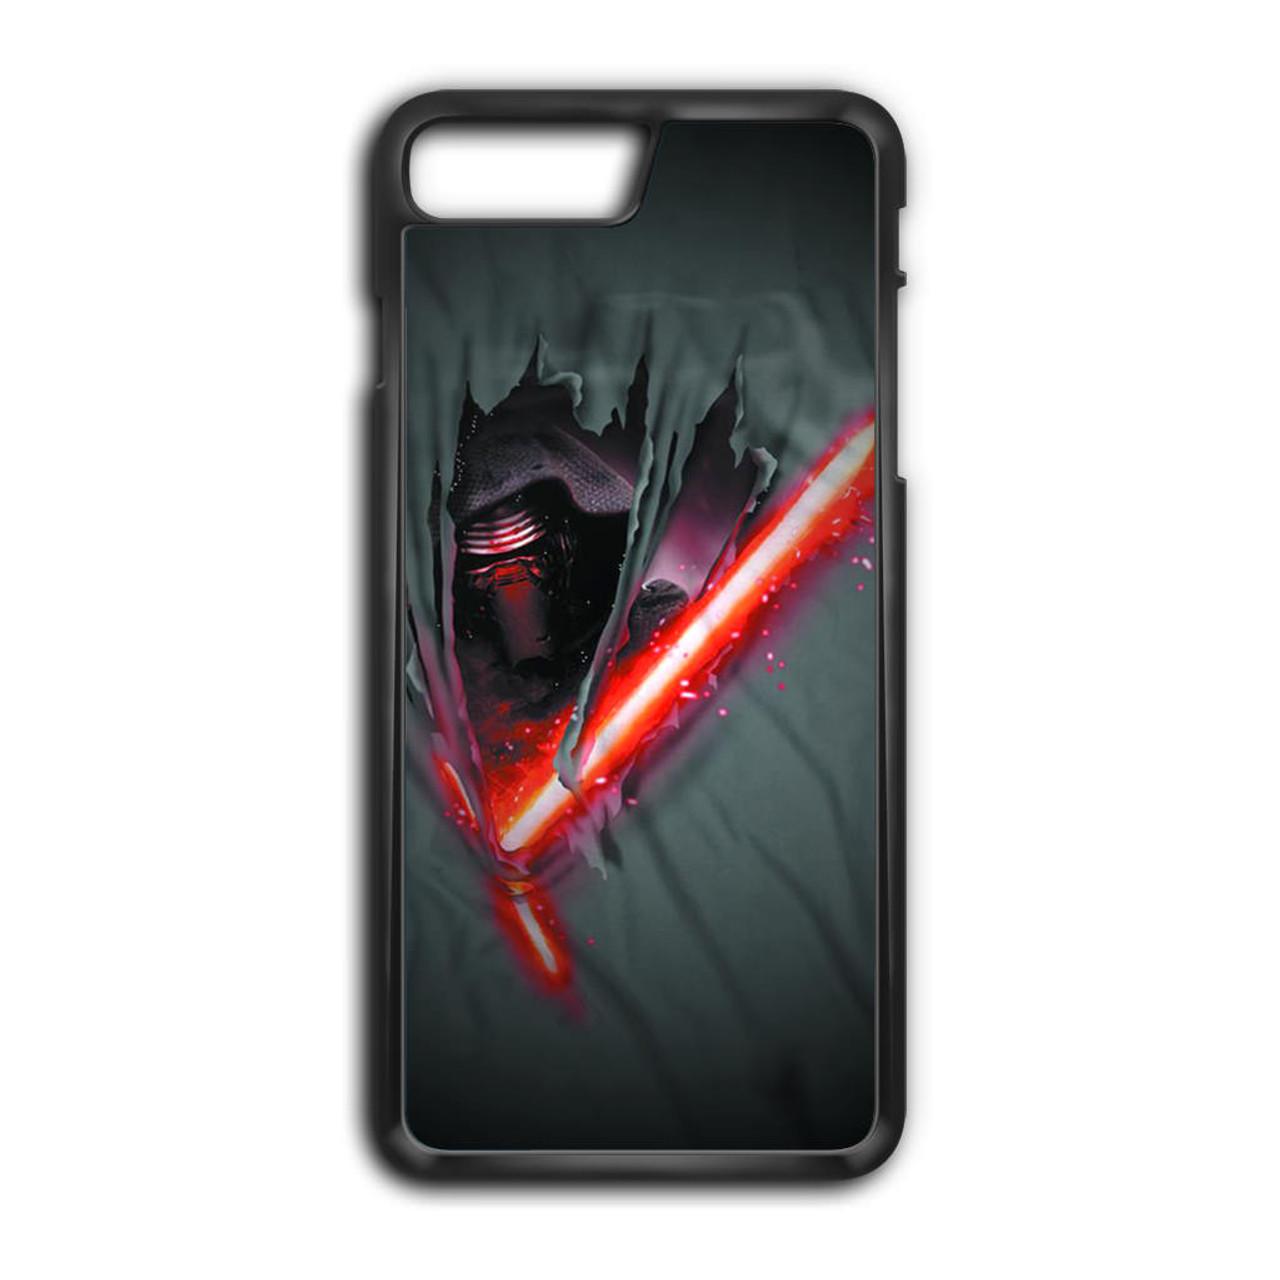 official photos 42898 3892d Kylo Ren Star Wars iPhone 7 Plus Case - CASESHUNTER